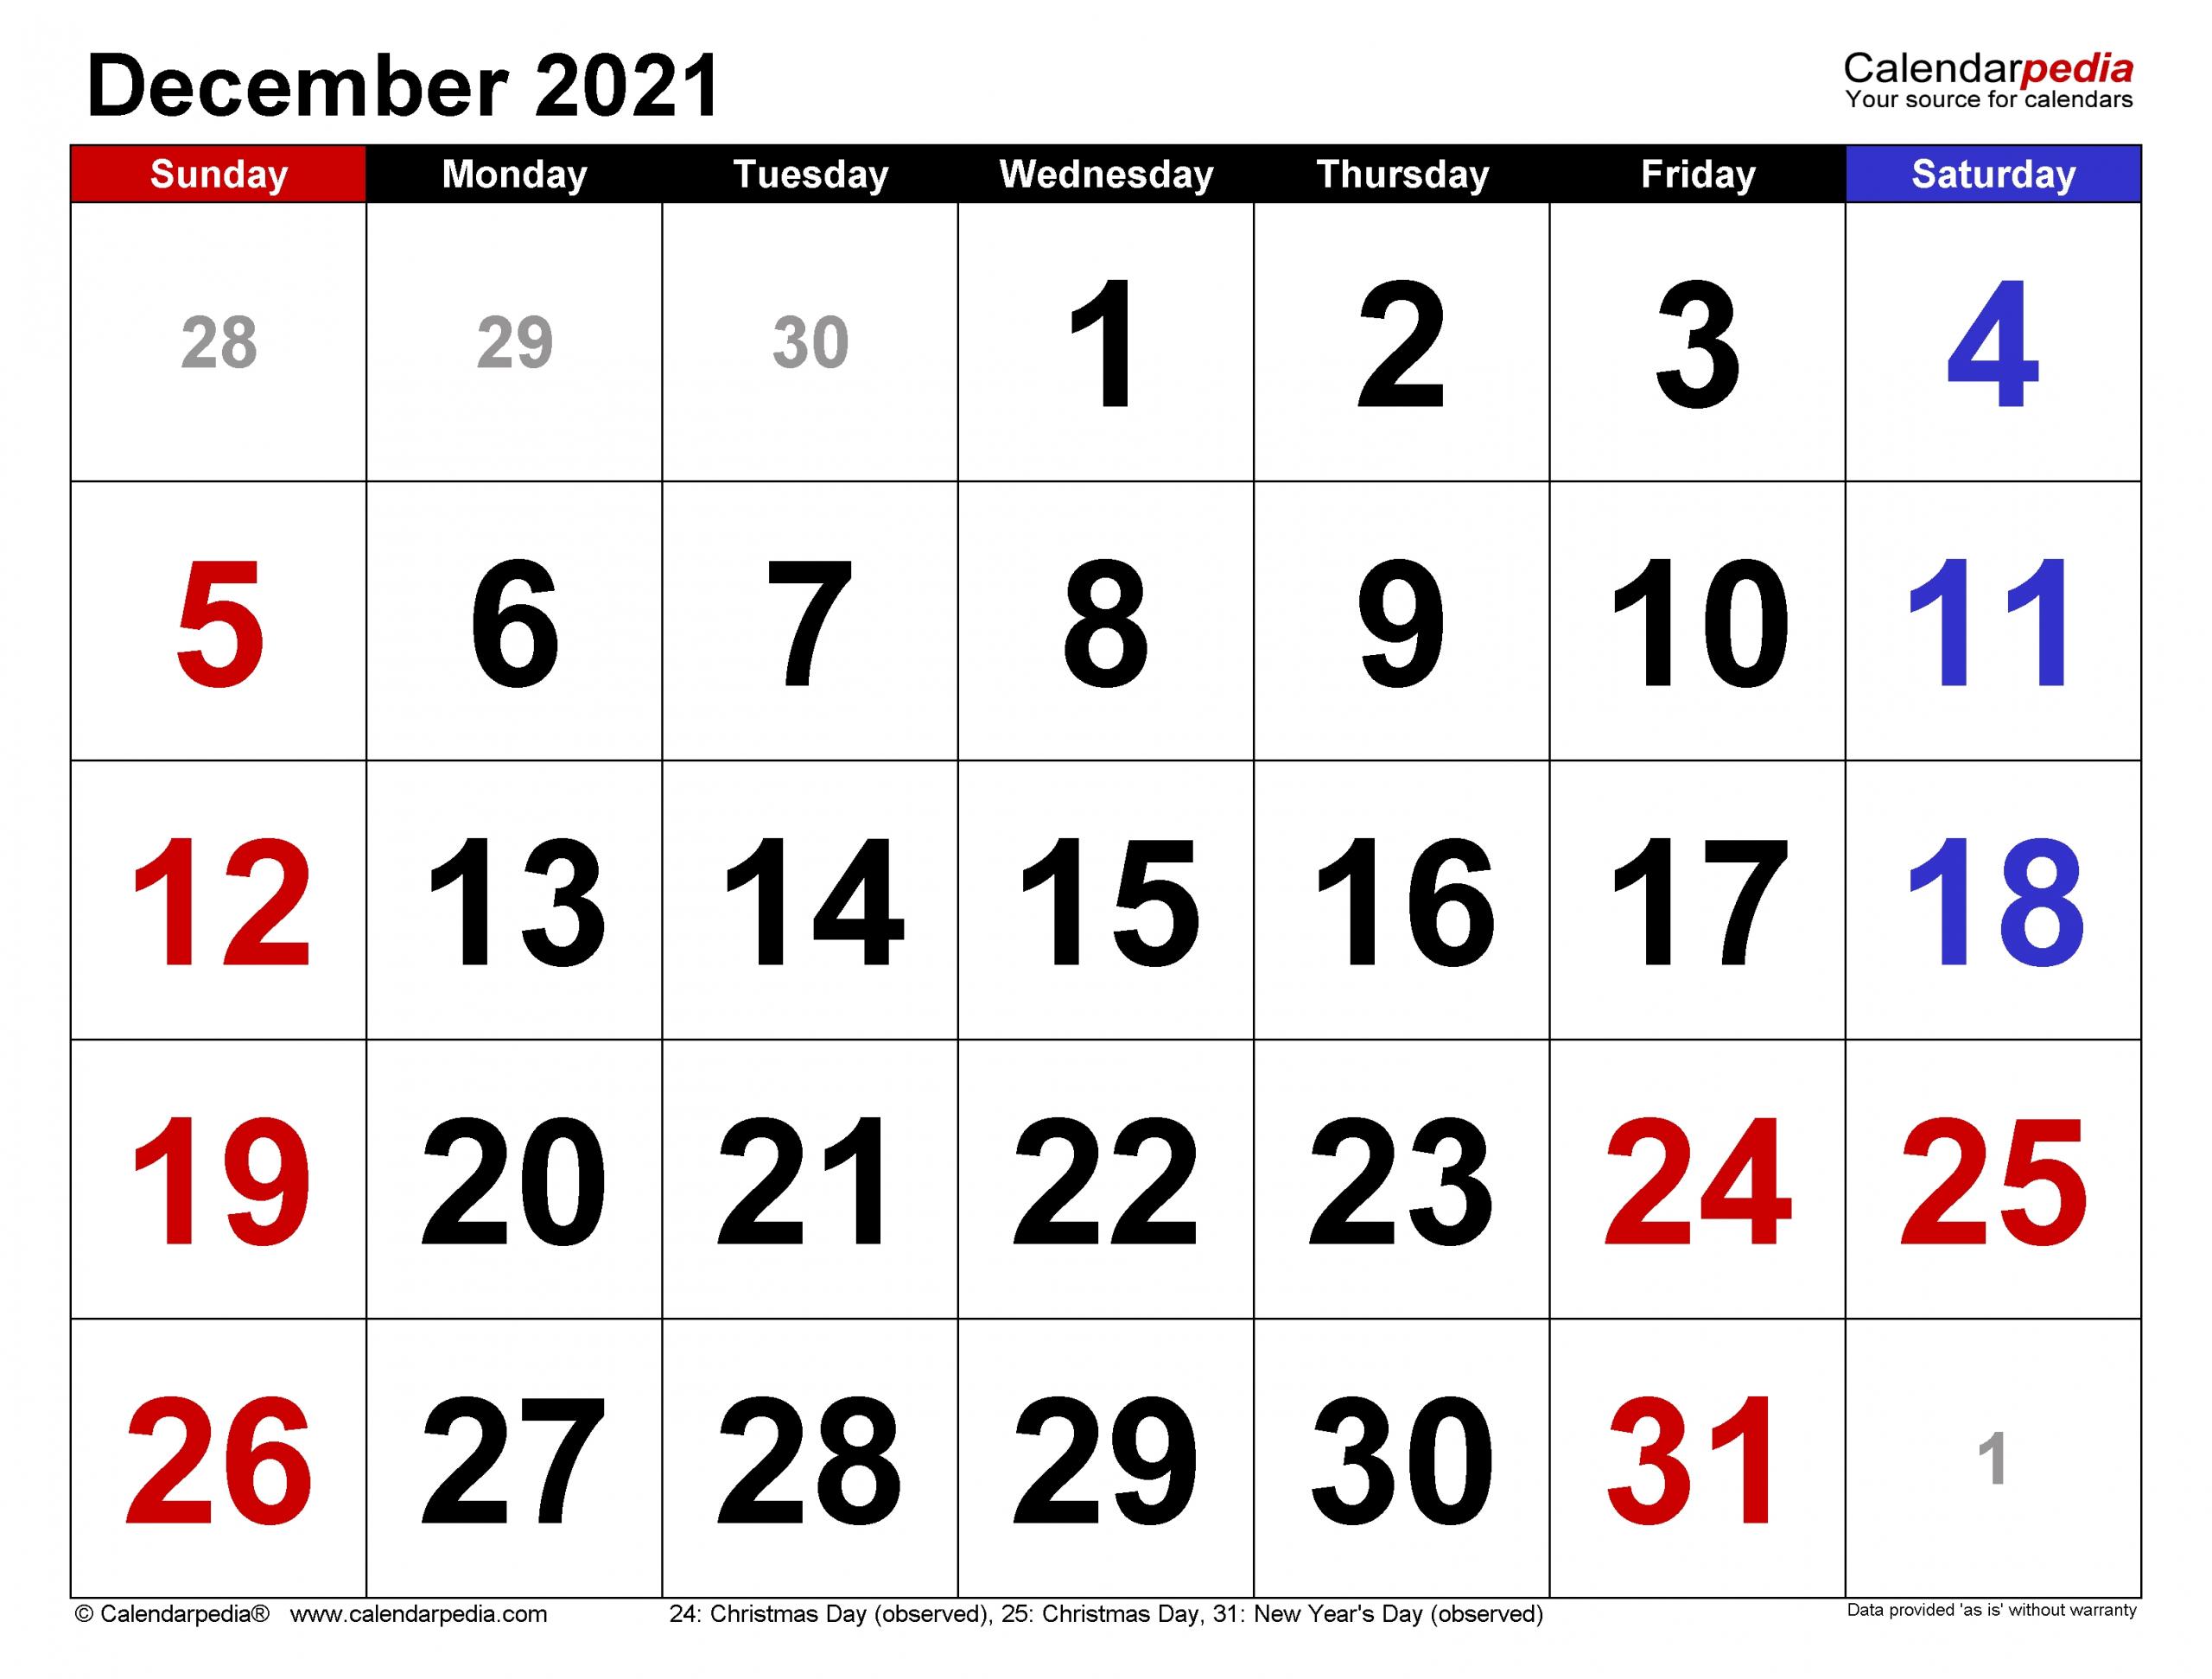 Free Editable December 2021 Calendar | Month Calendar December 2021 Calendar Printable Free